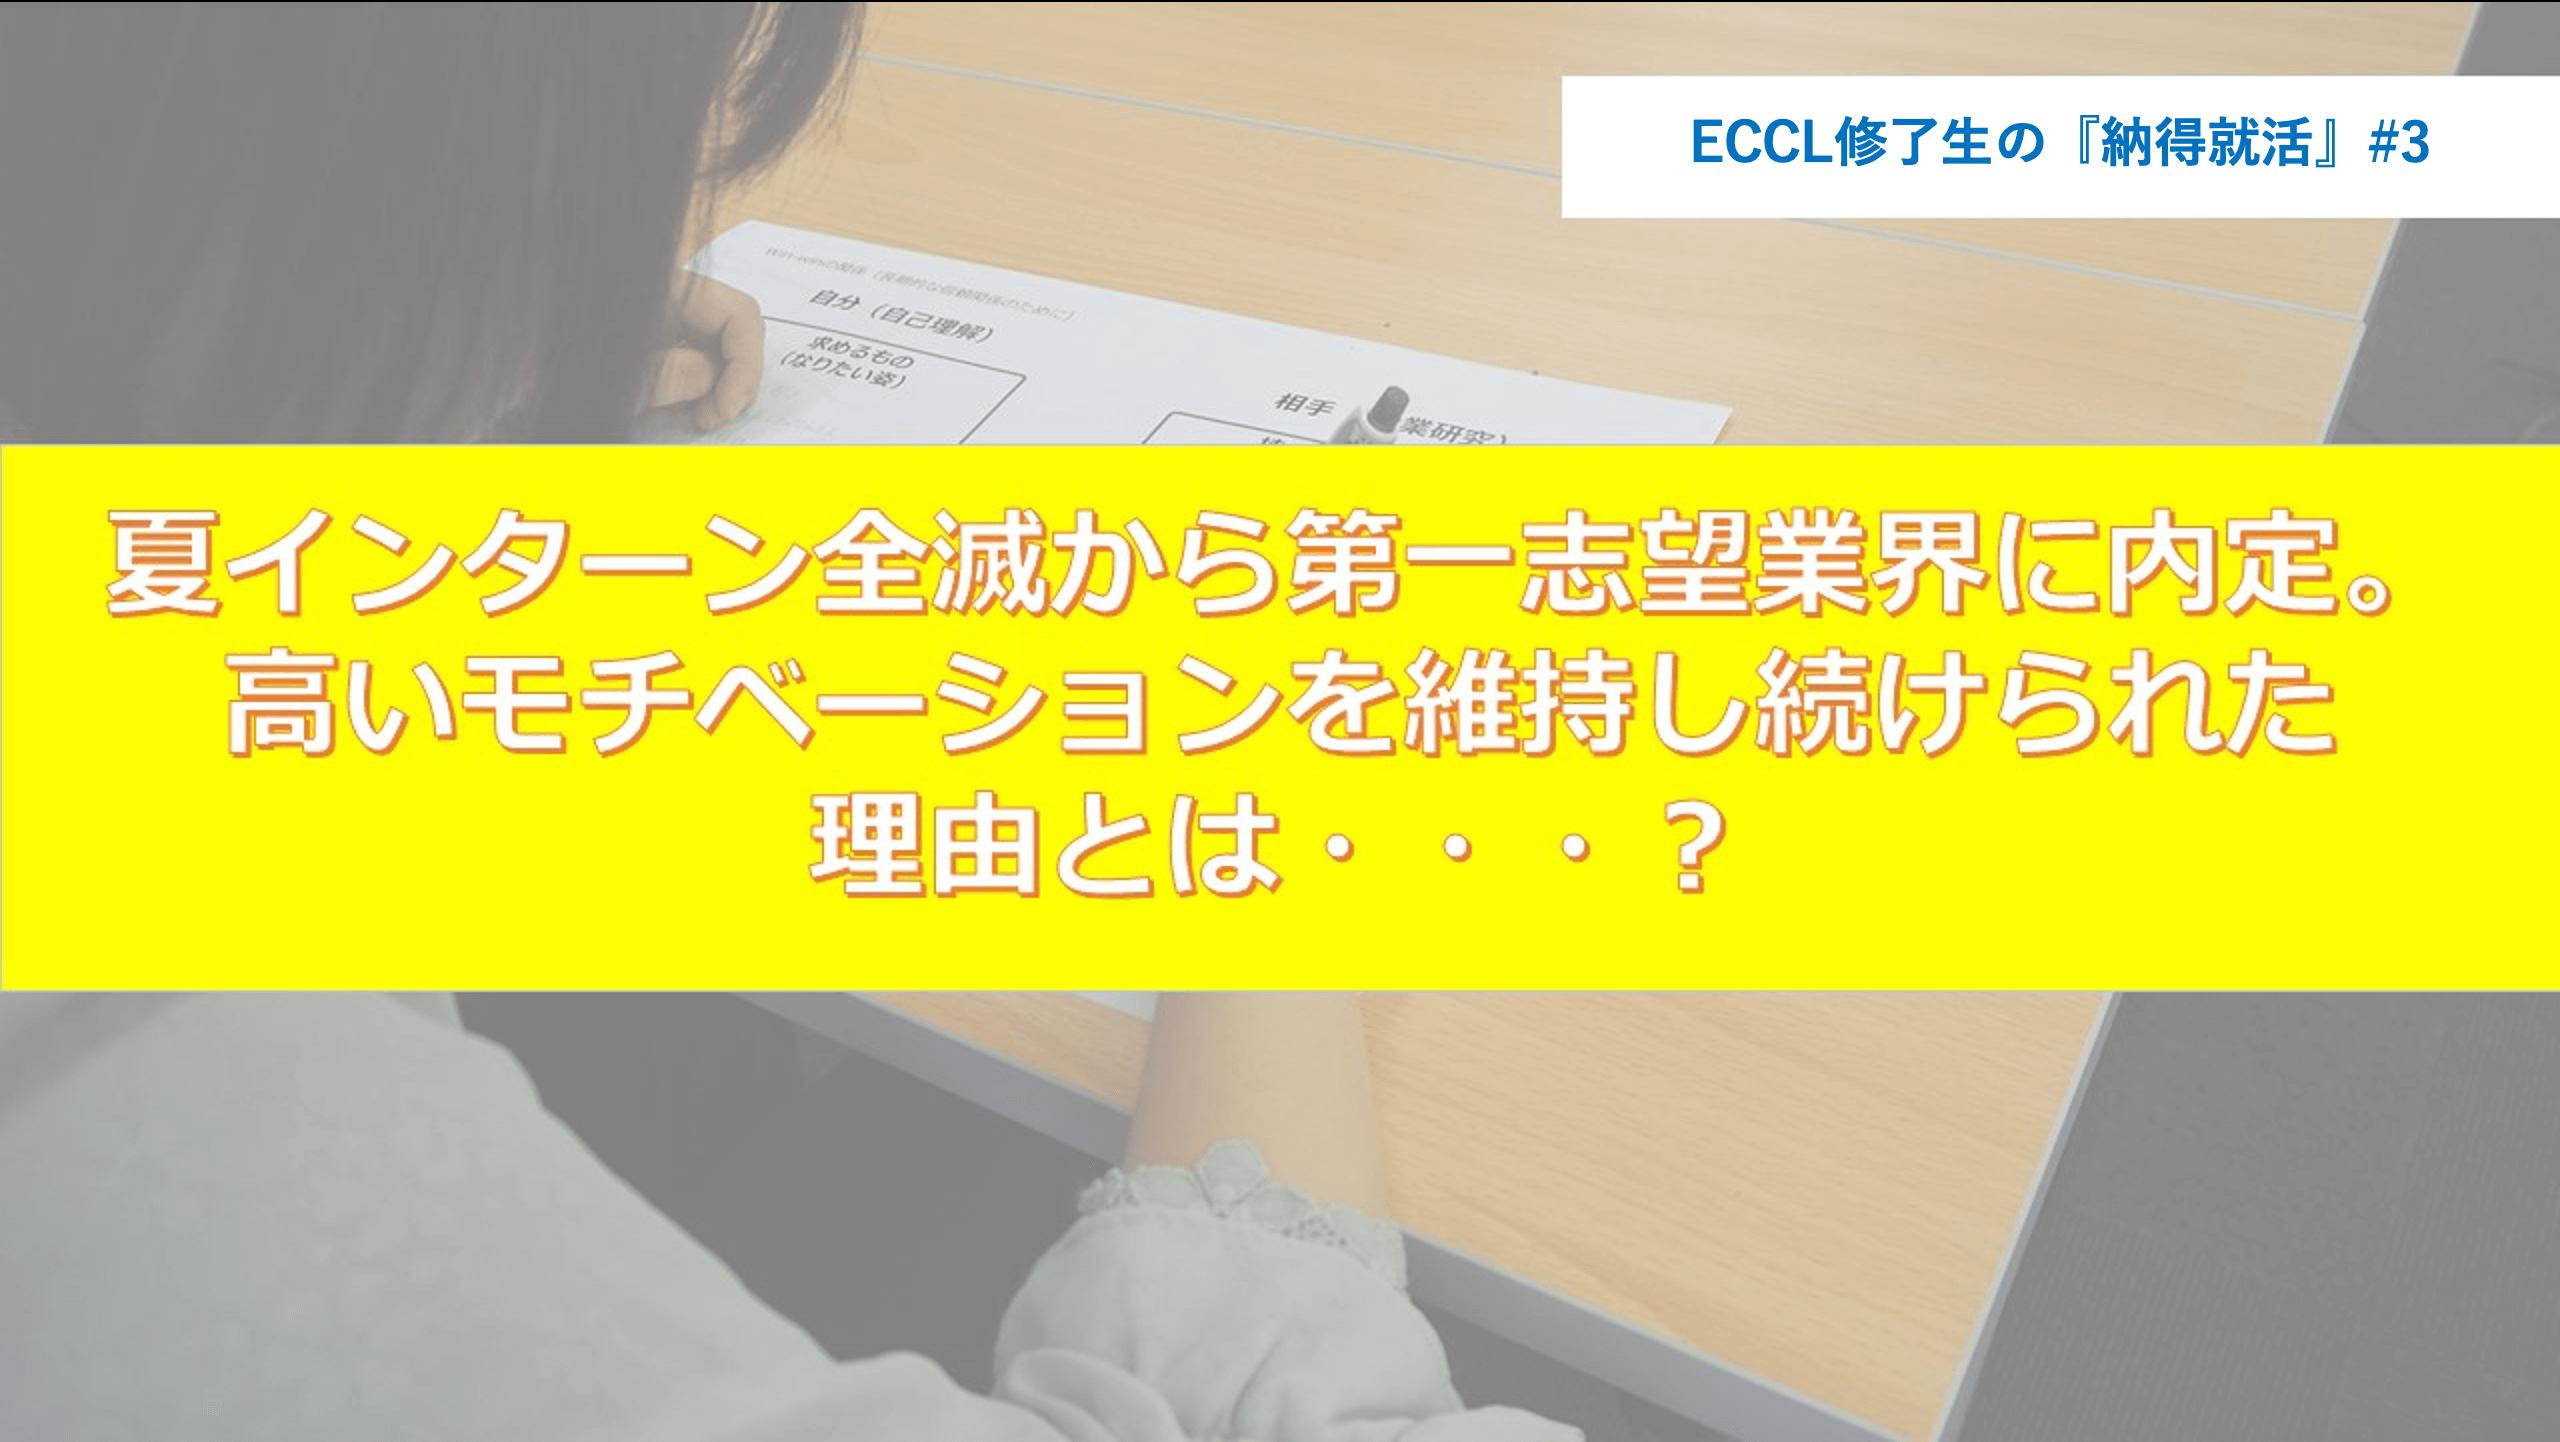 ECCL修了生の『納得就活』#3 〜生命保険会社内定/納得就活ストーリーをインタビュー!〜